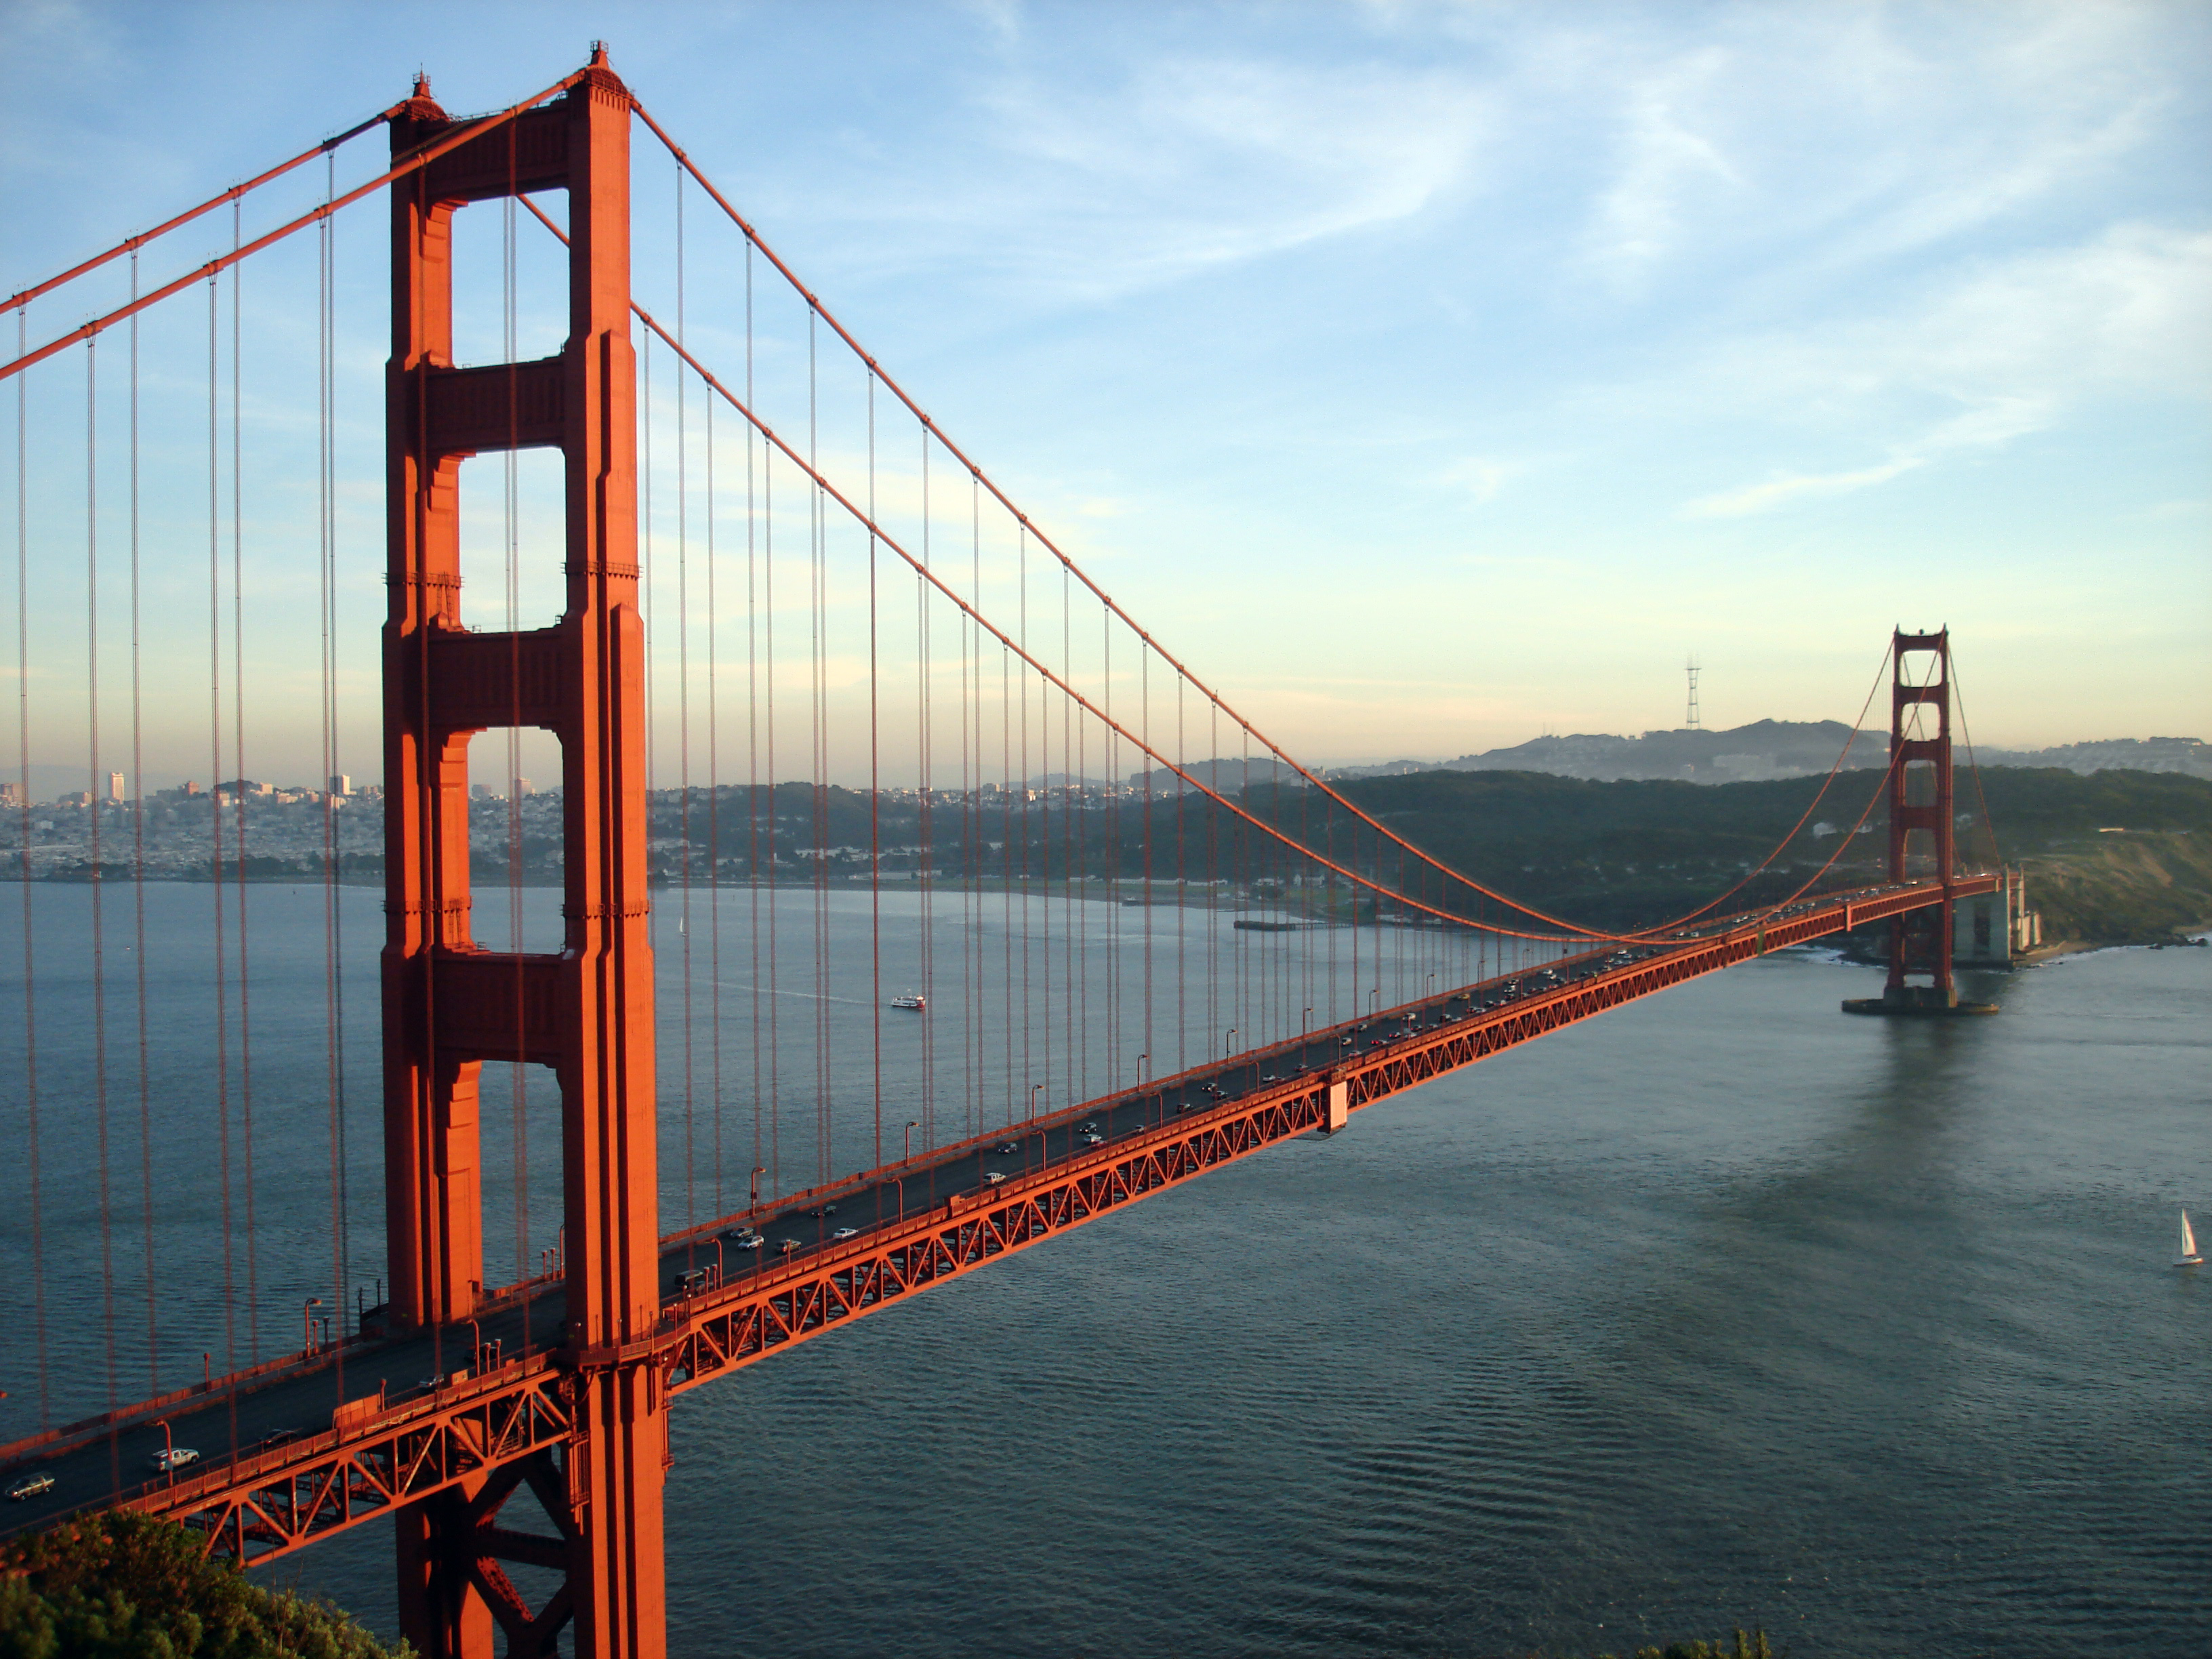 Simple Golden Gate Bridge Png - File:goldengatebridge 001.jpg, Transparent background PNG HD thumbnail